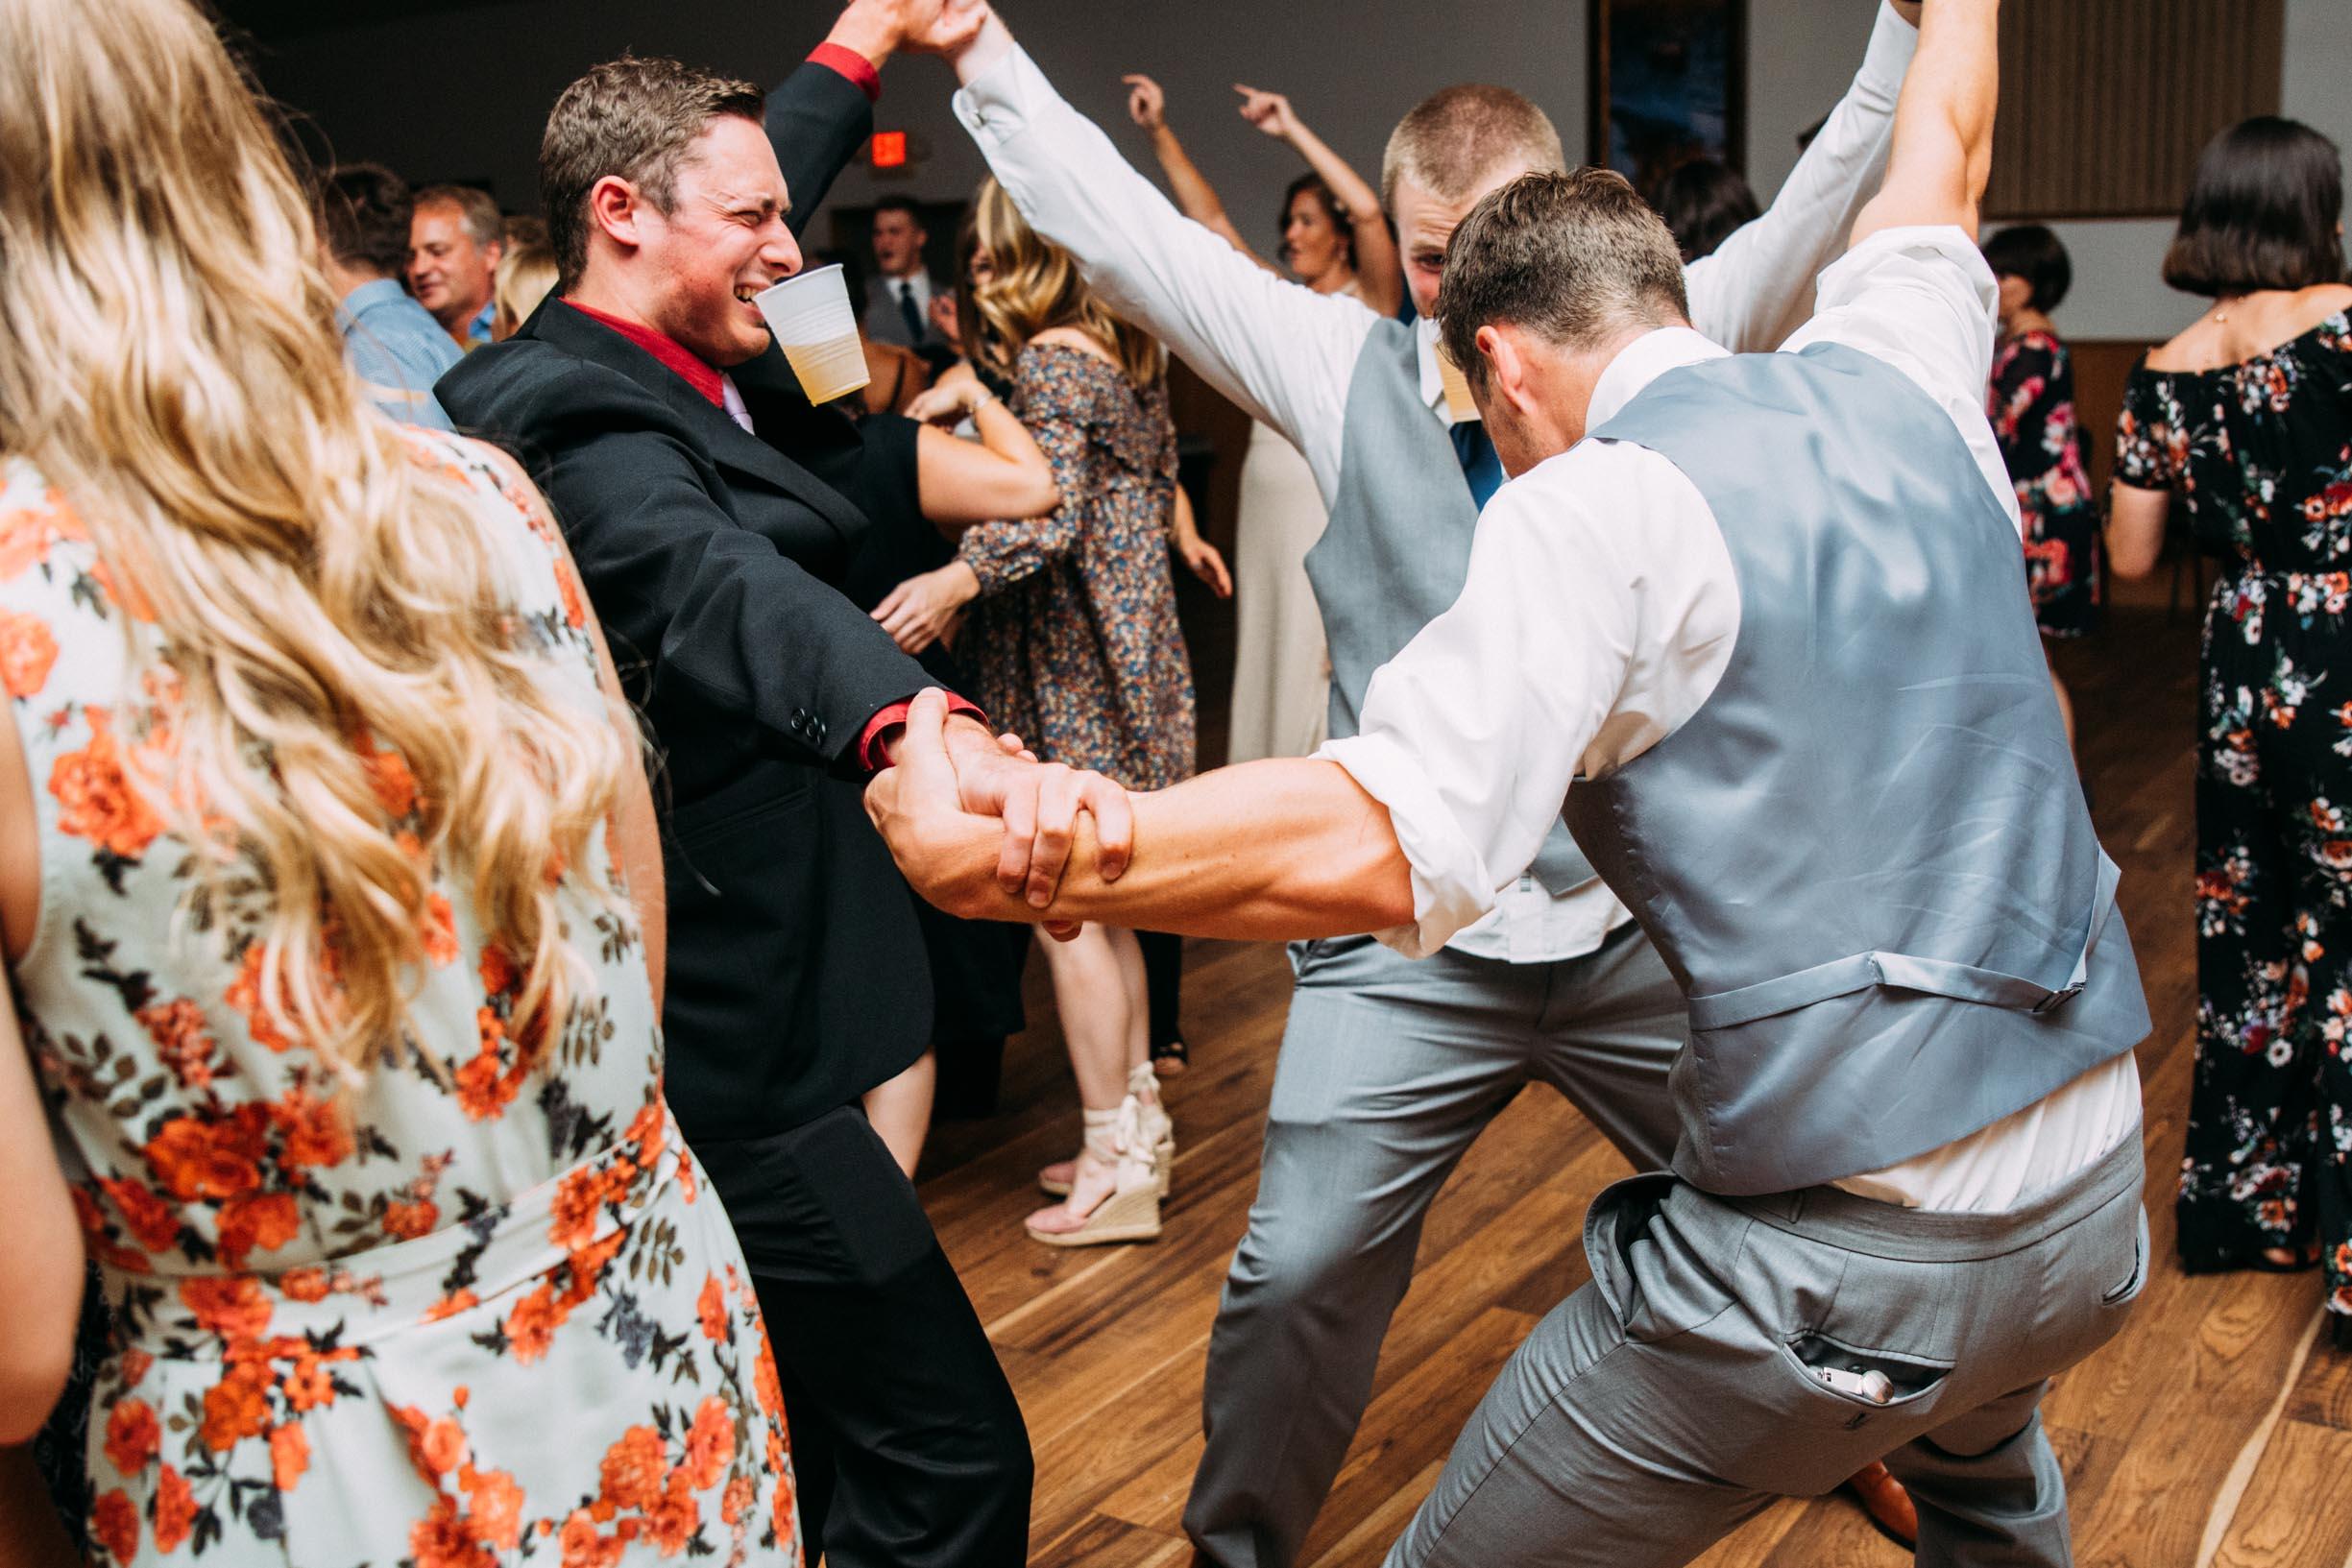 44-Lindsey Jake Wedding Reception Winona_.jpg